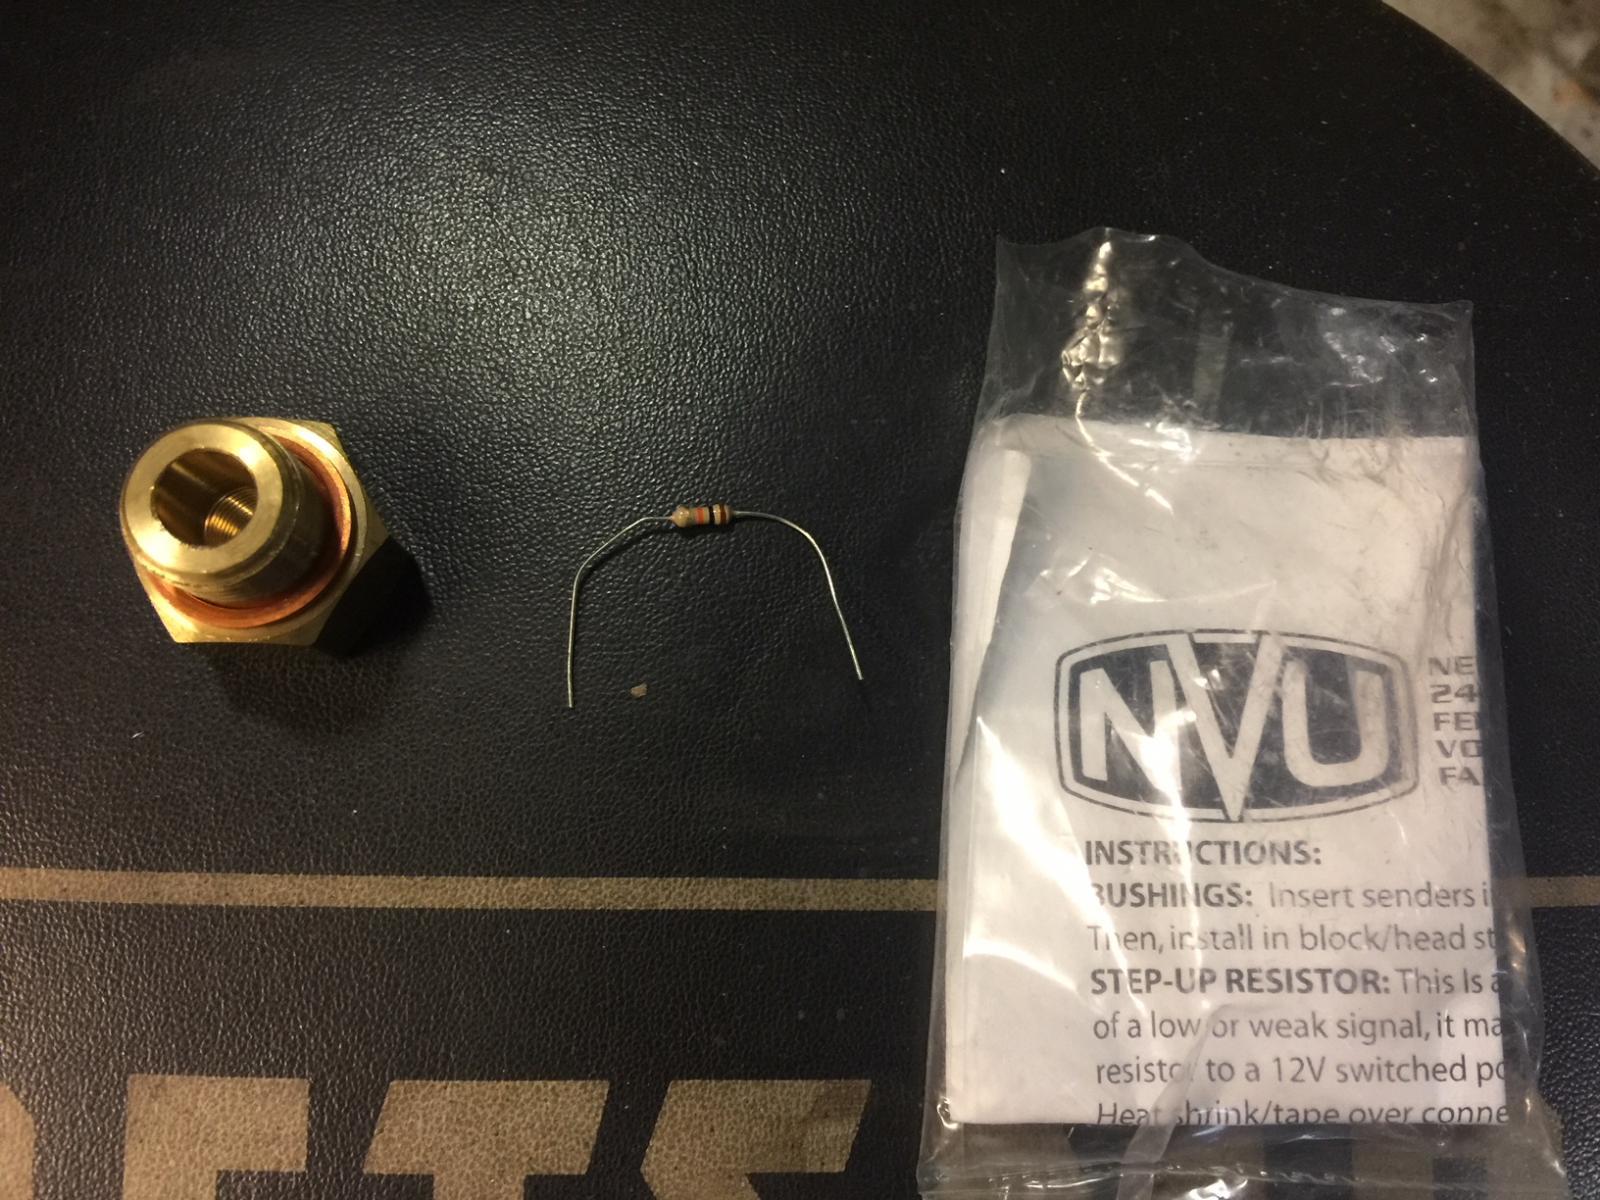 LS swap New Vintage USA Oil pressure sender adapter and Step